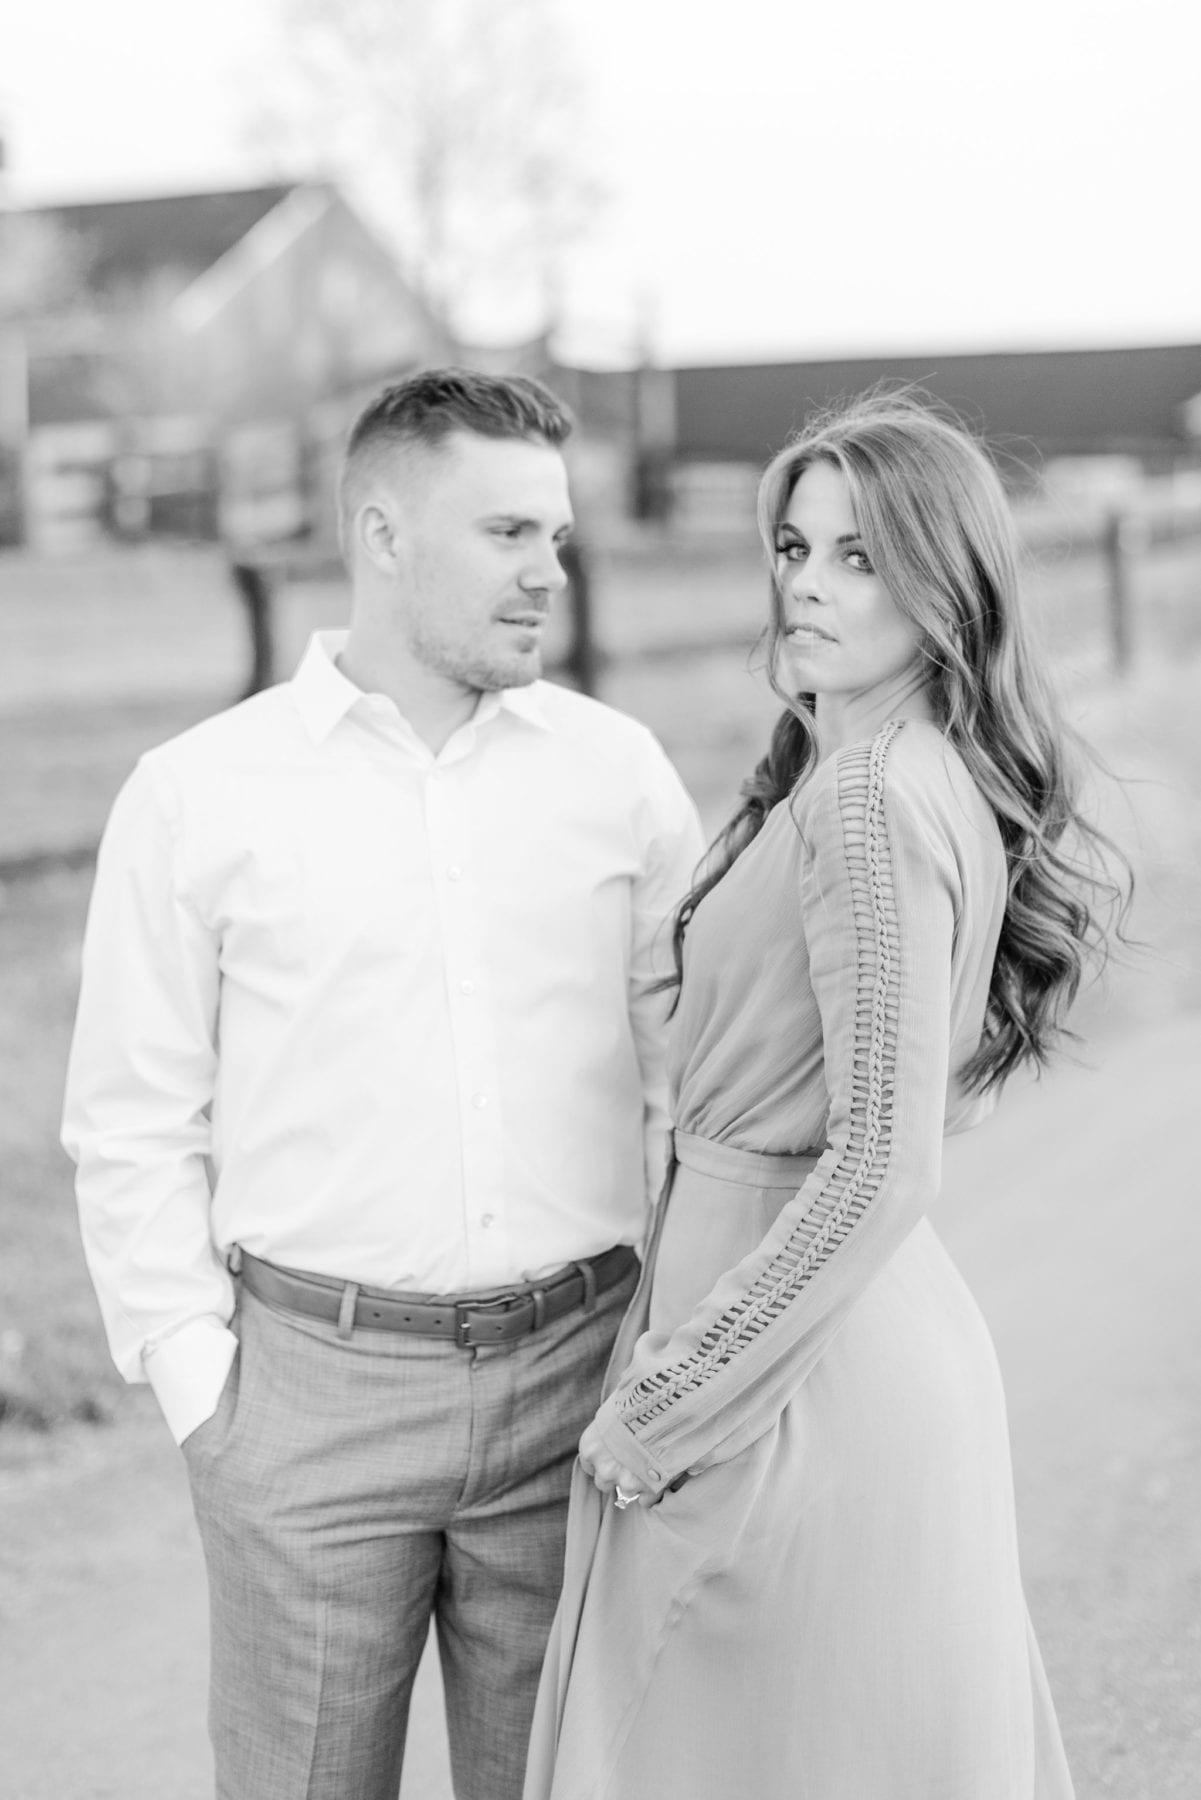 Goodstone Inn Engagement Session Virginia Wedding Photographer Megan Kelsey Photography-292.jpg